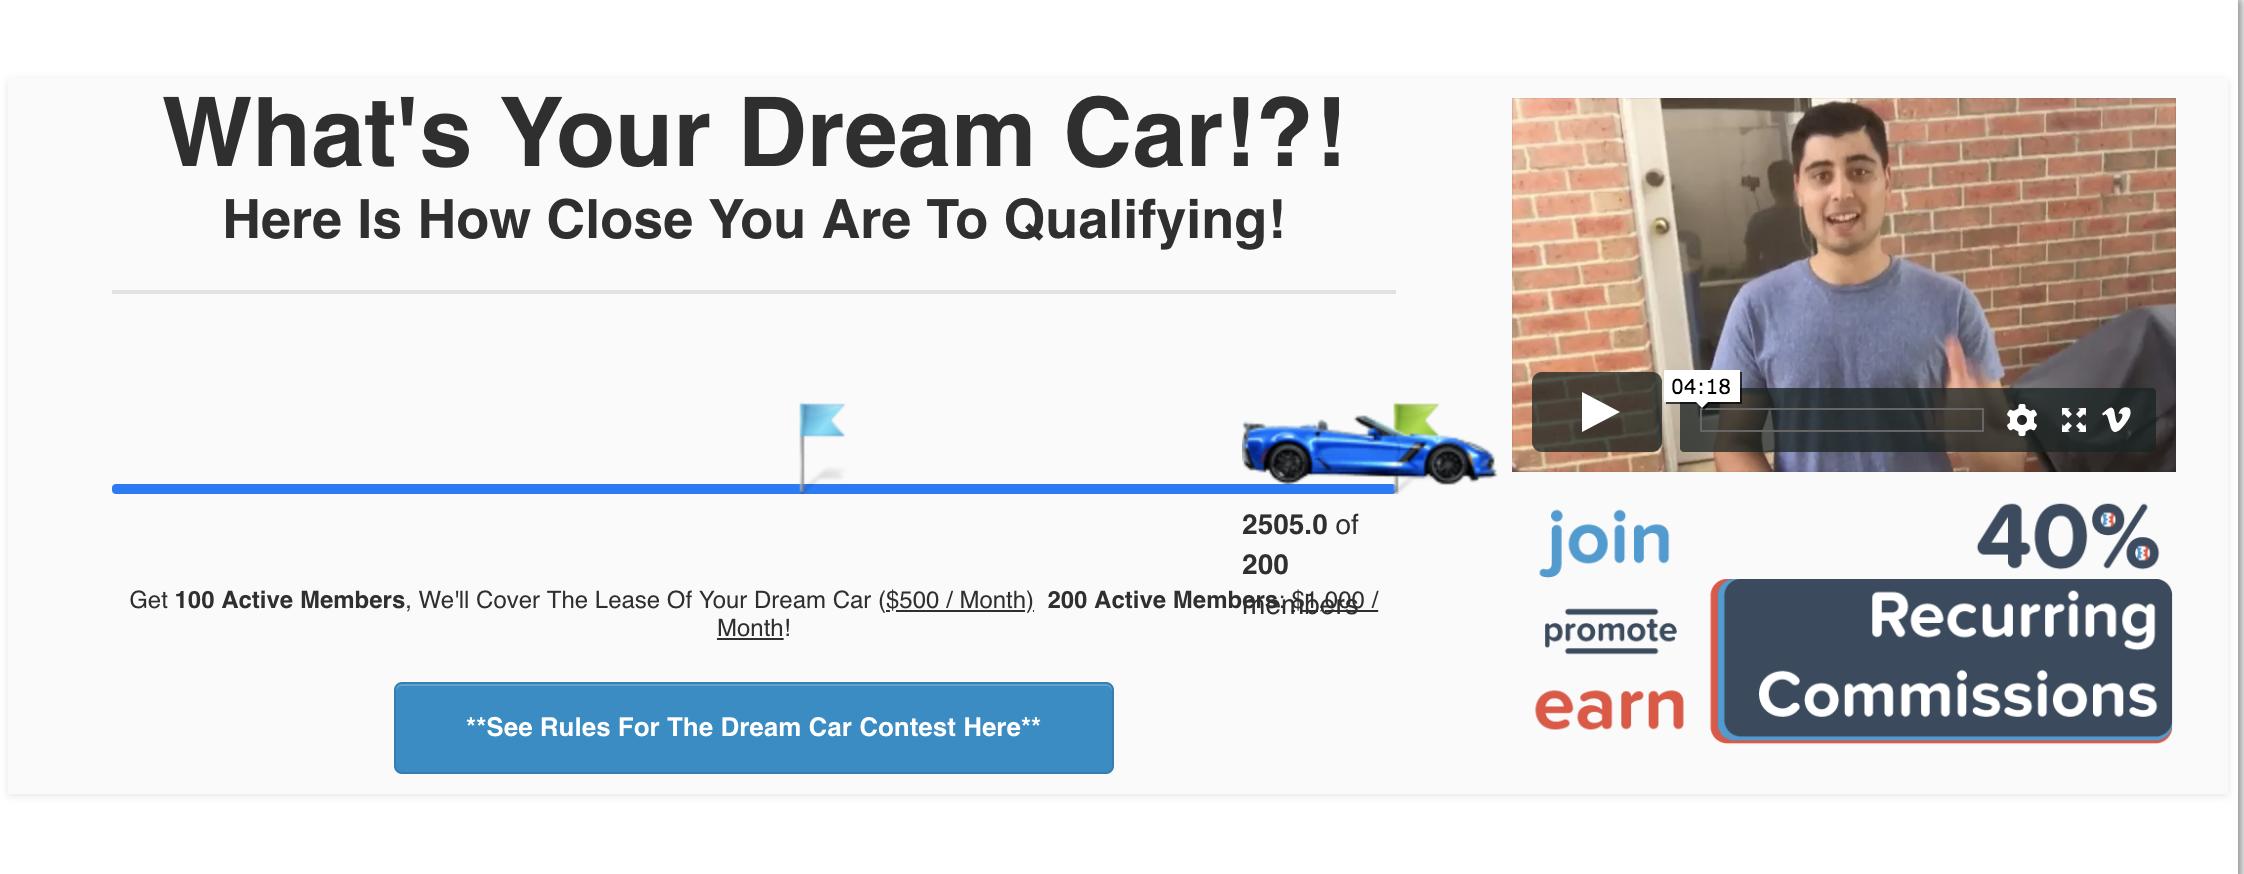 Spencer Mecham ClickFunnels Dream Car Winner